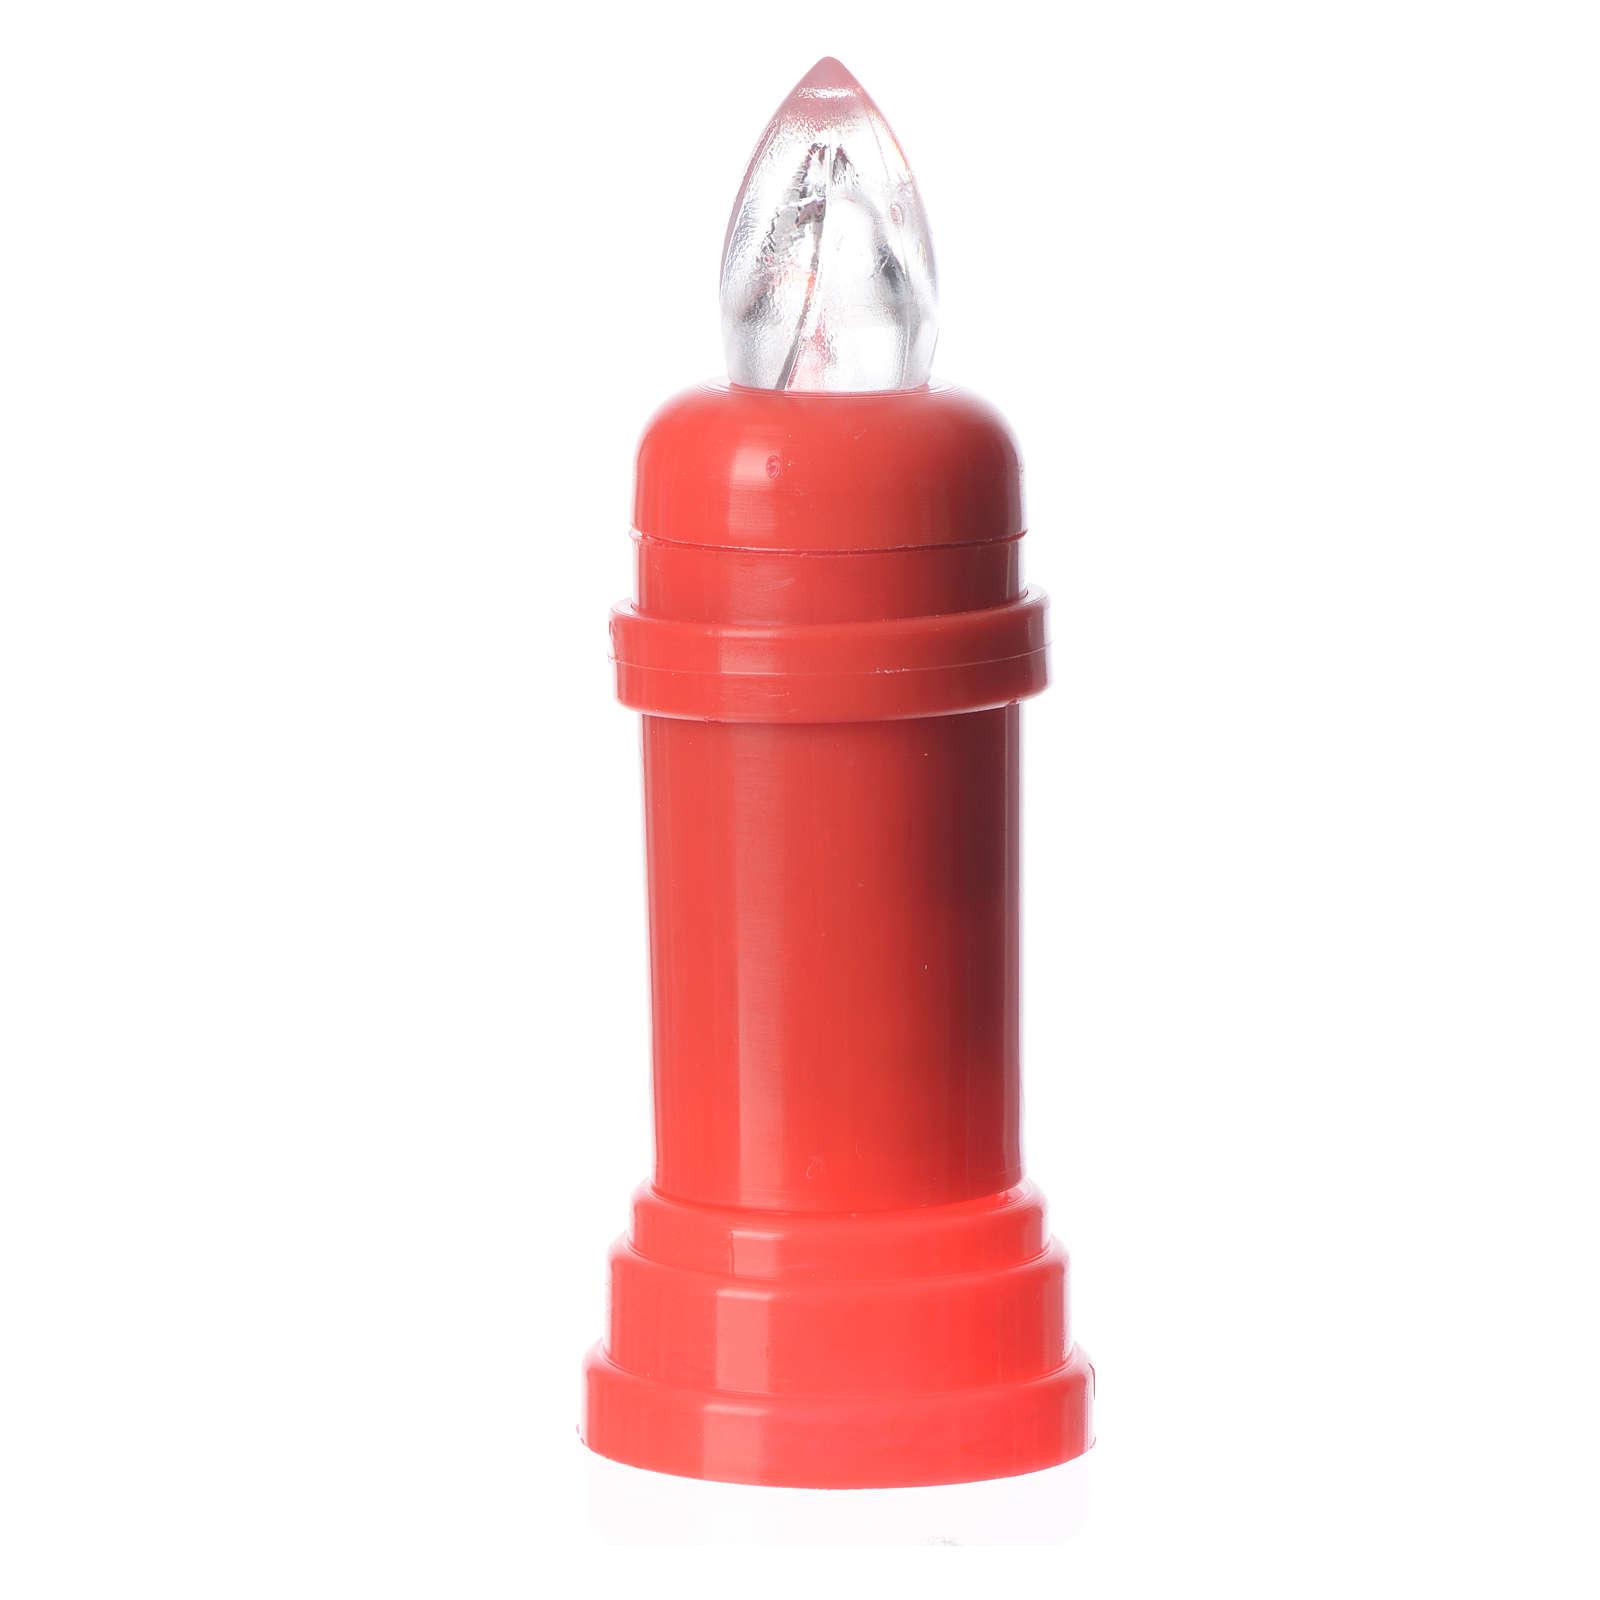 Vela eléctrica roja parpadeante con adhesivo 3